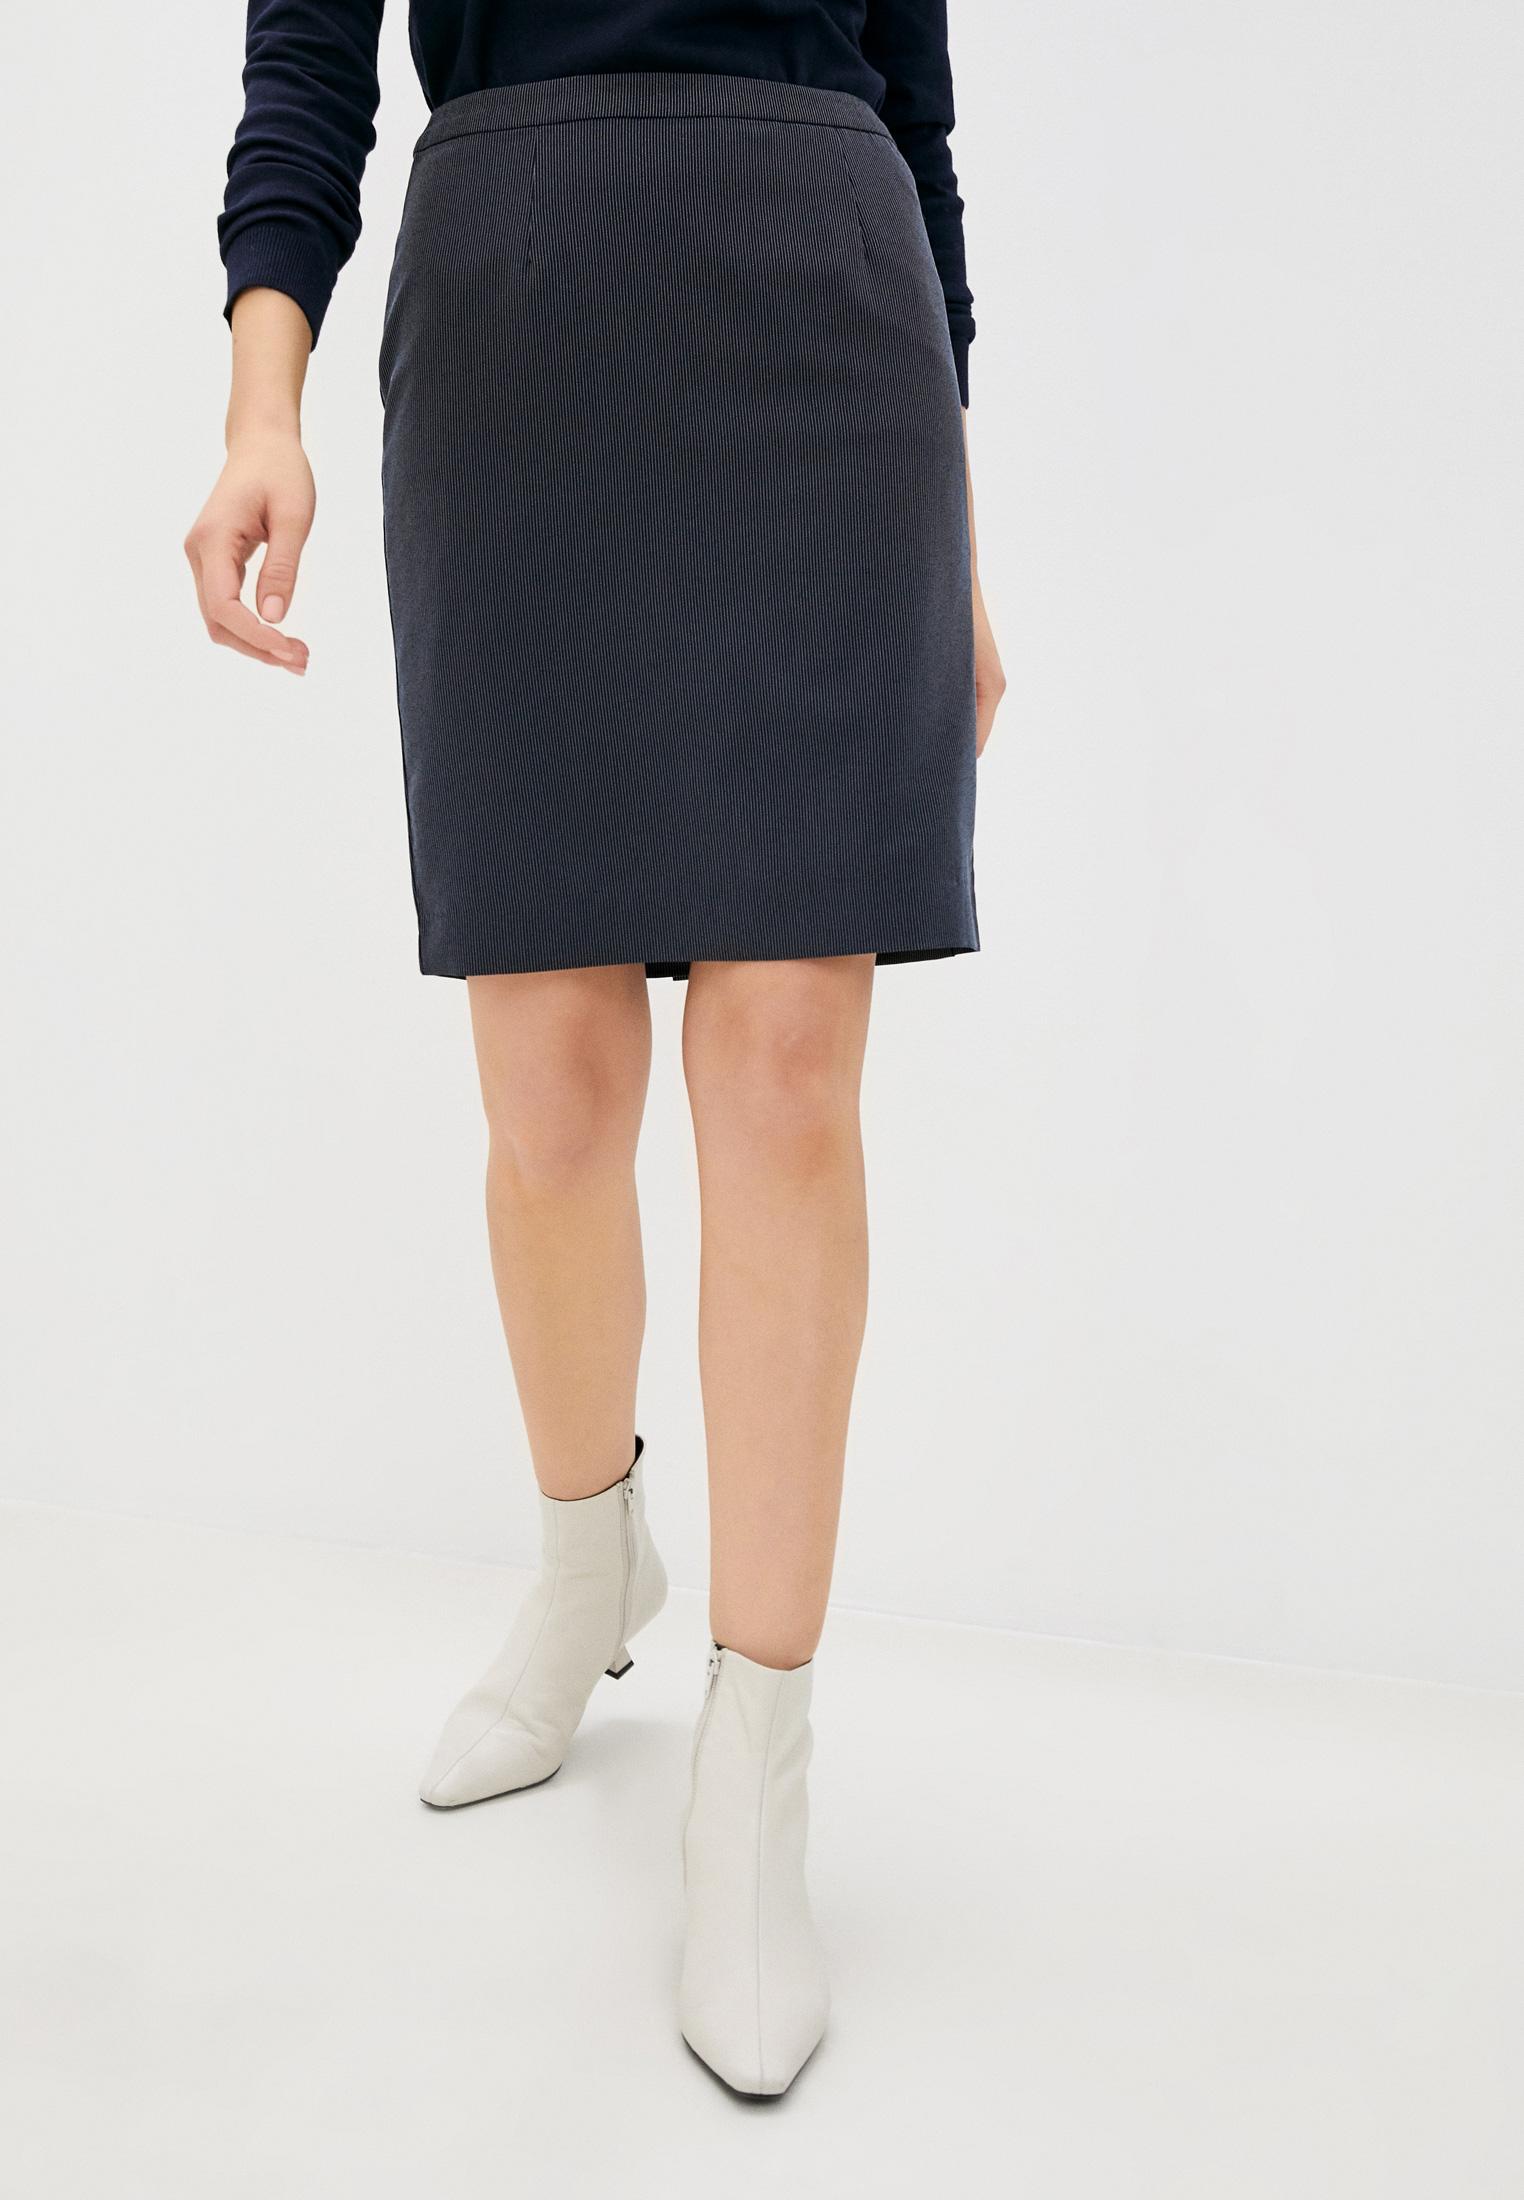 Прямая юбка Zolla 20327866012